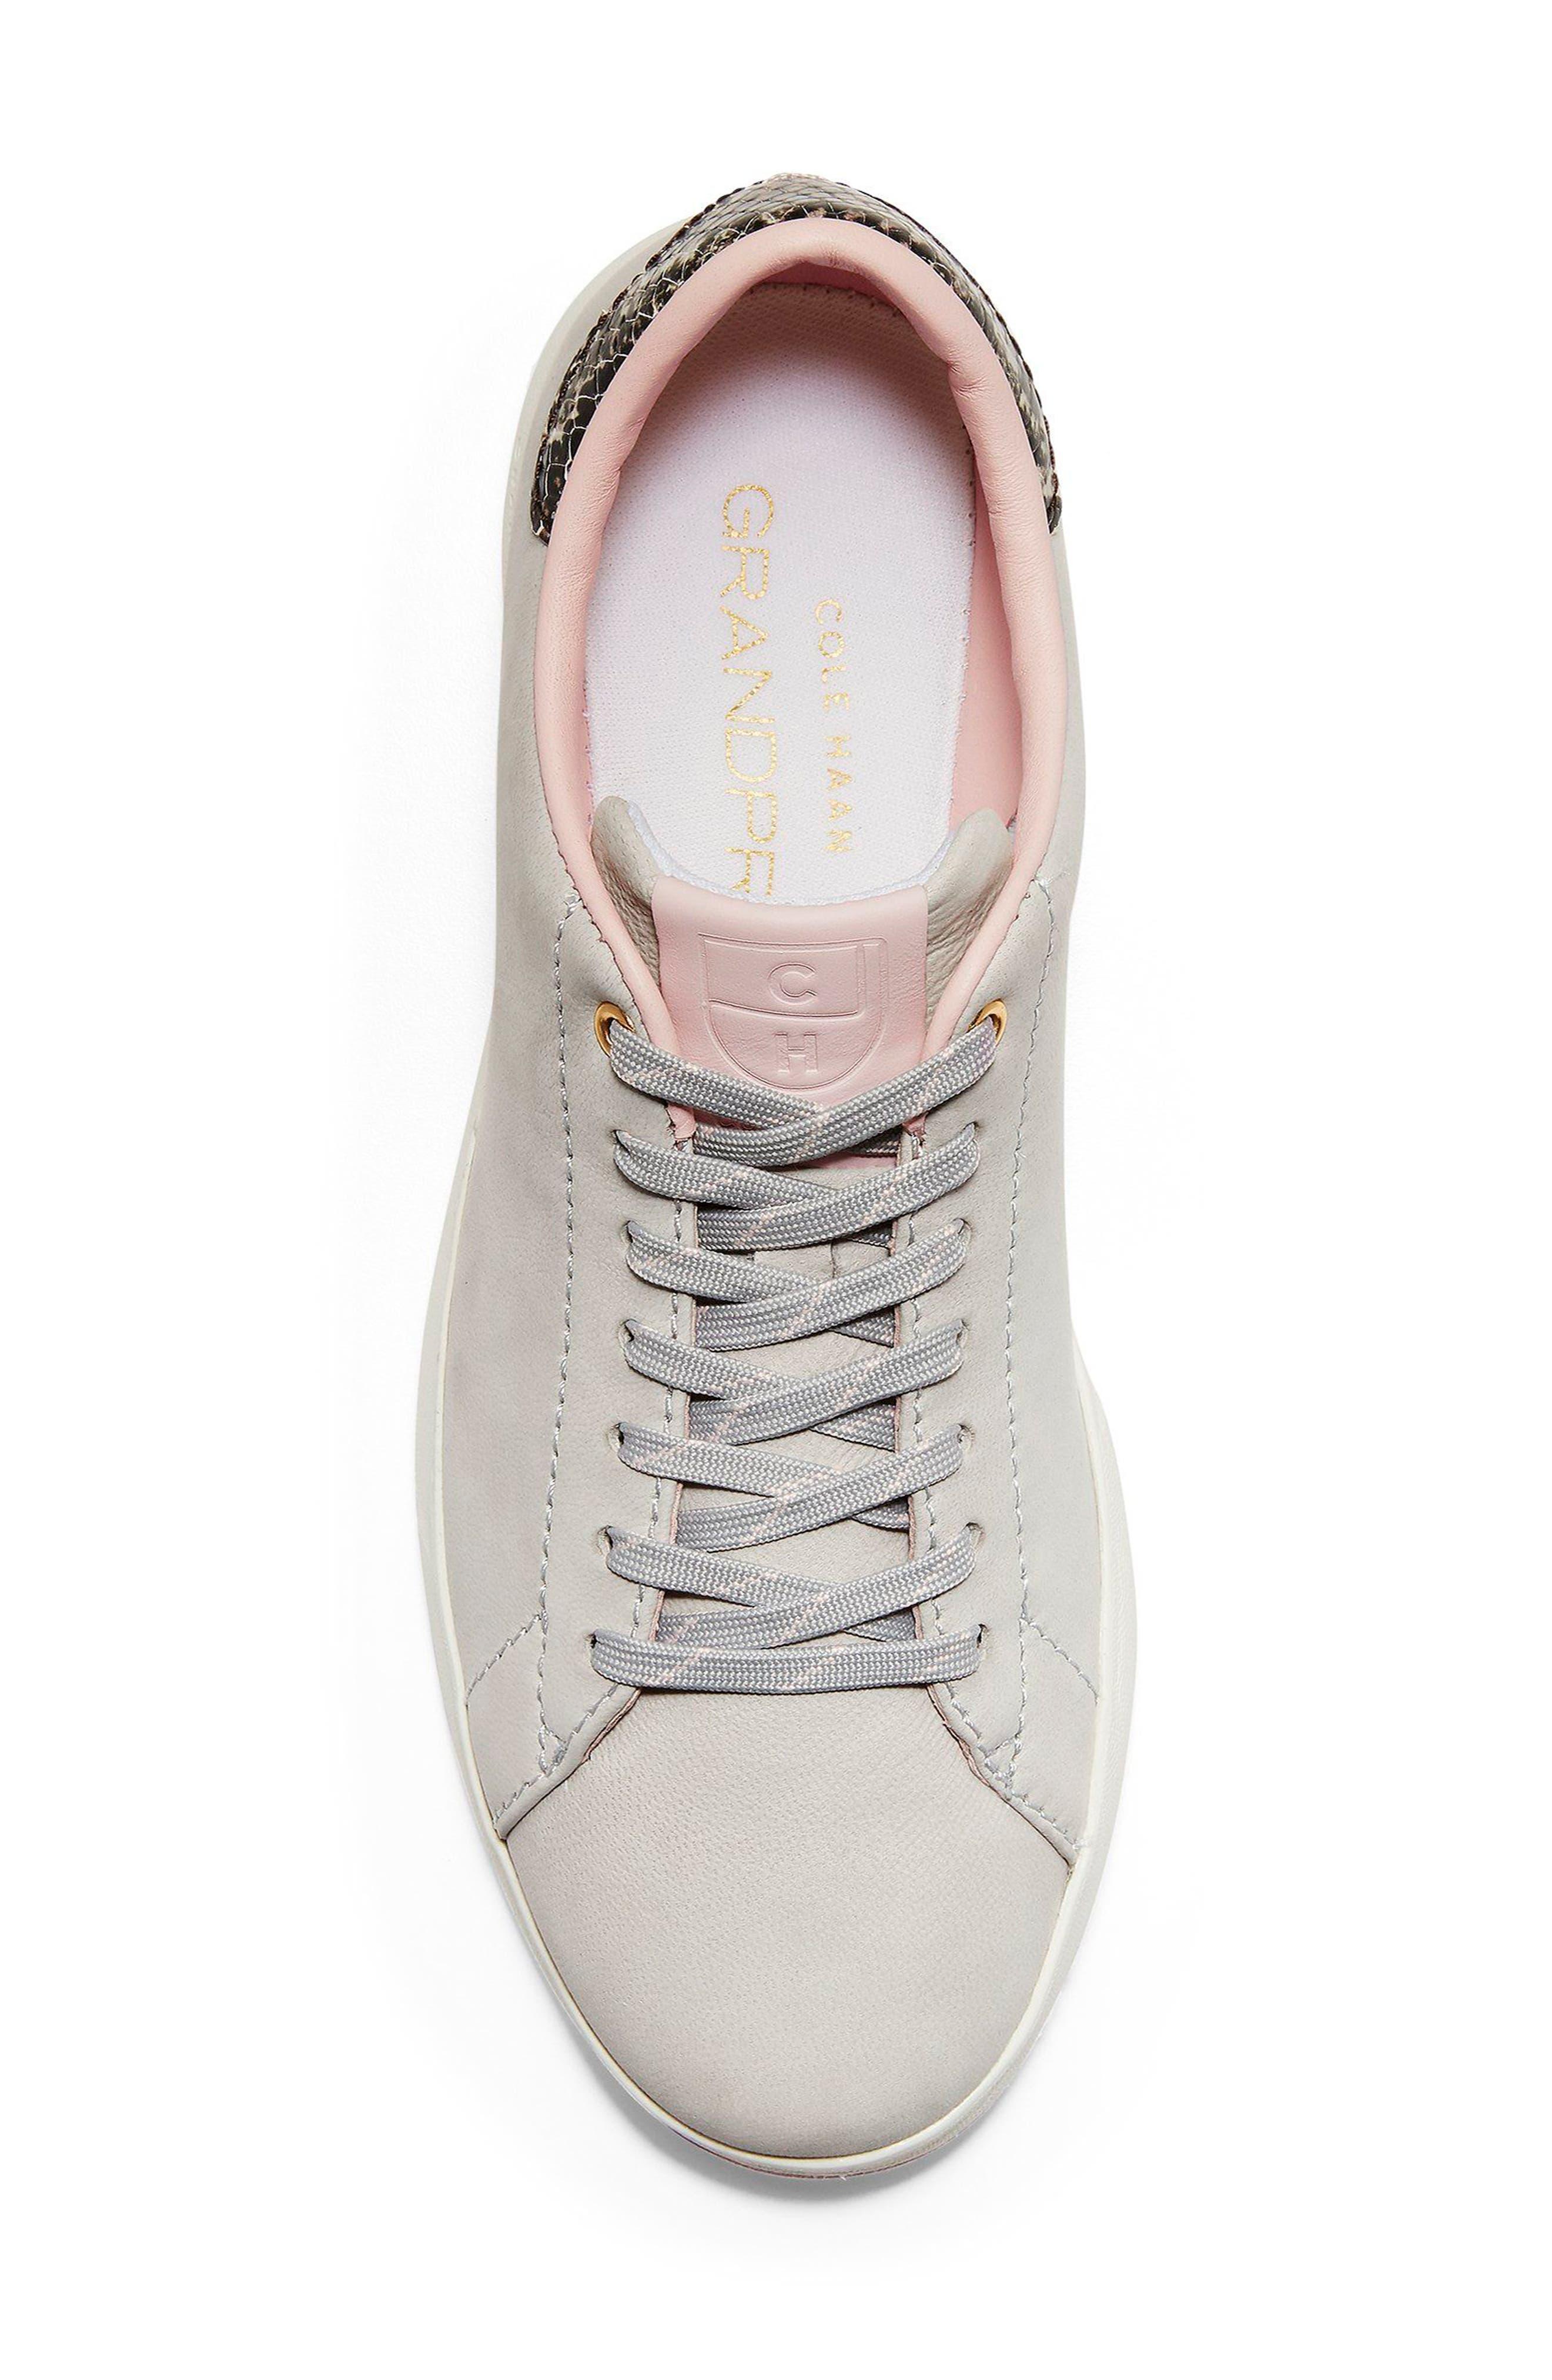 GrandPro Tennis Shoe,                             Alternate thumbnail 9, color,                             Vapor Grey Nubuck